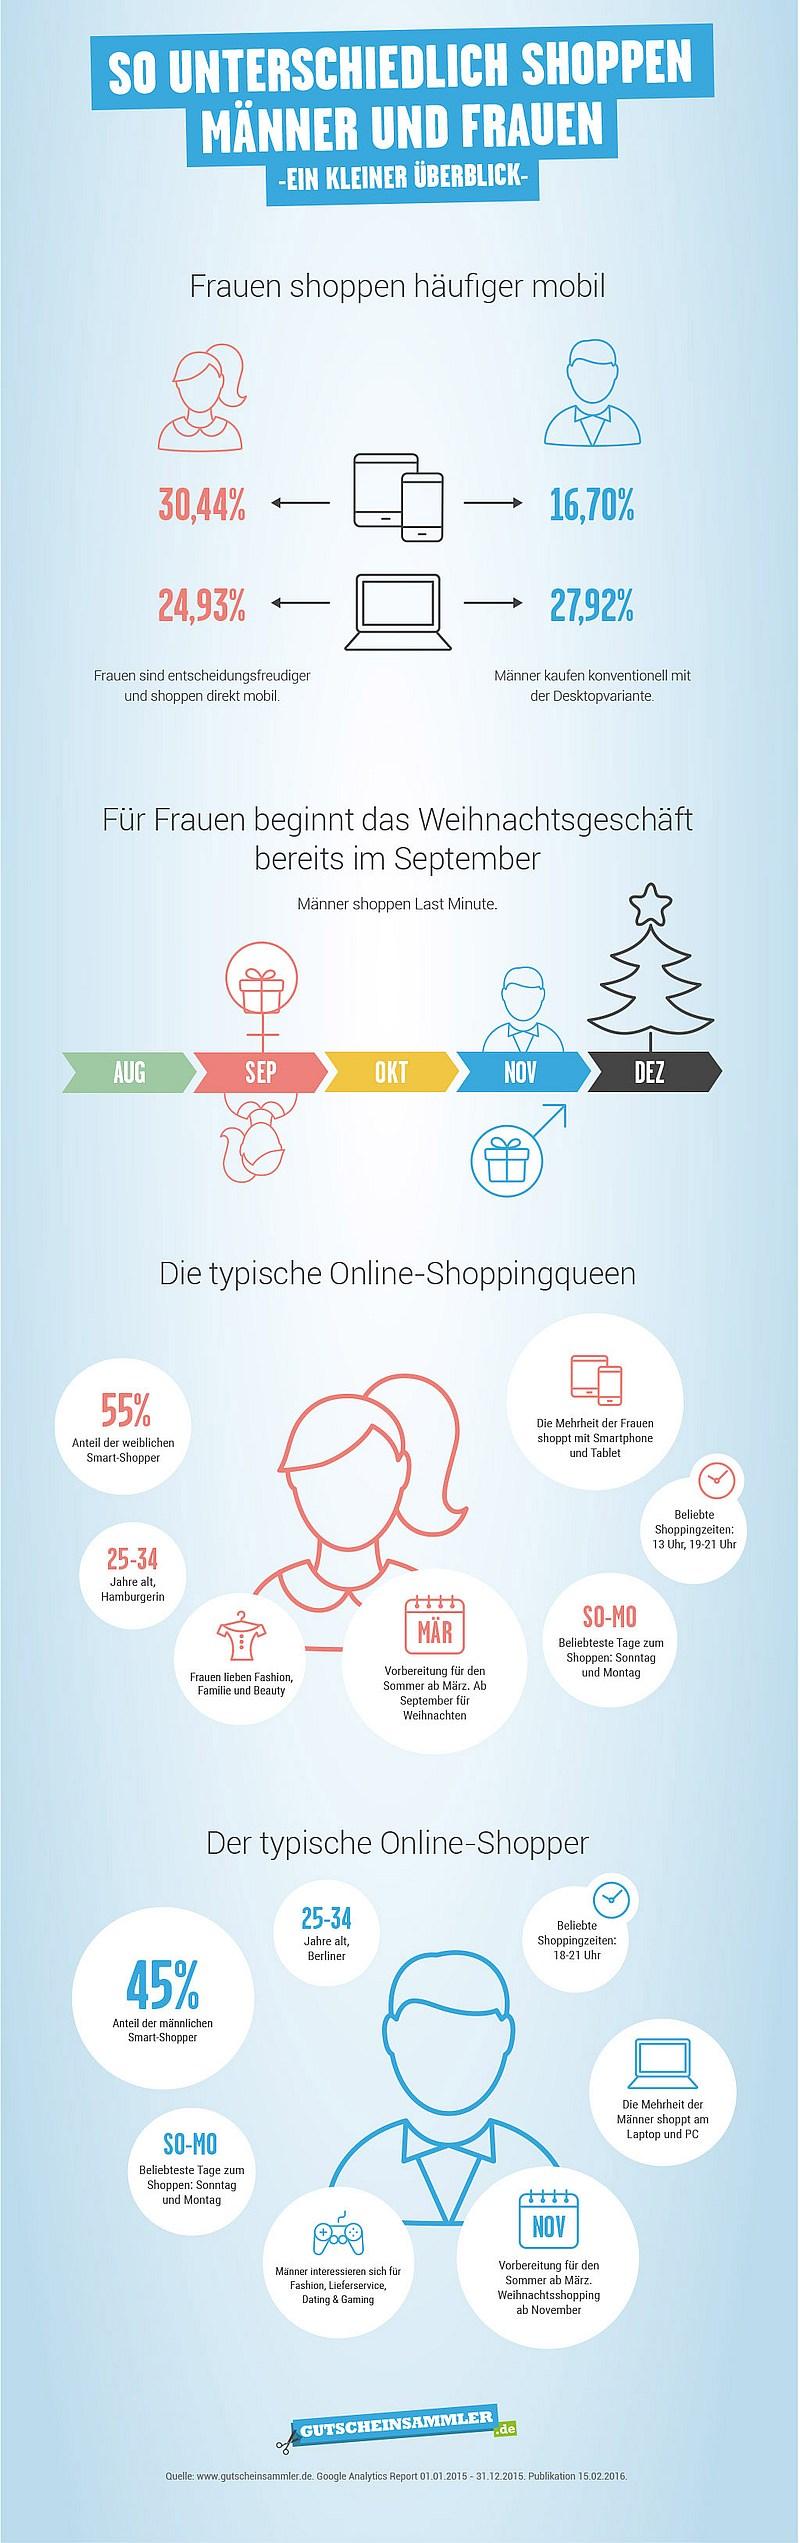 infografik gutscheinsammler shopping verhalten